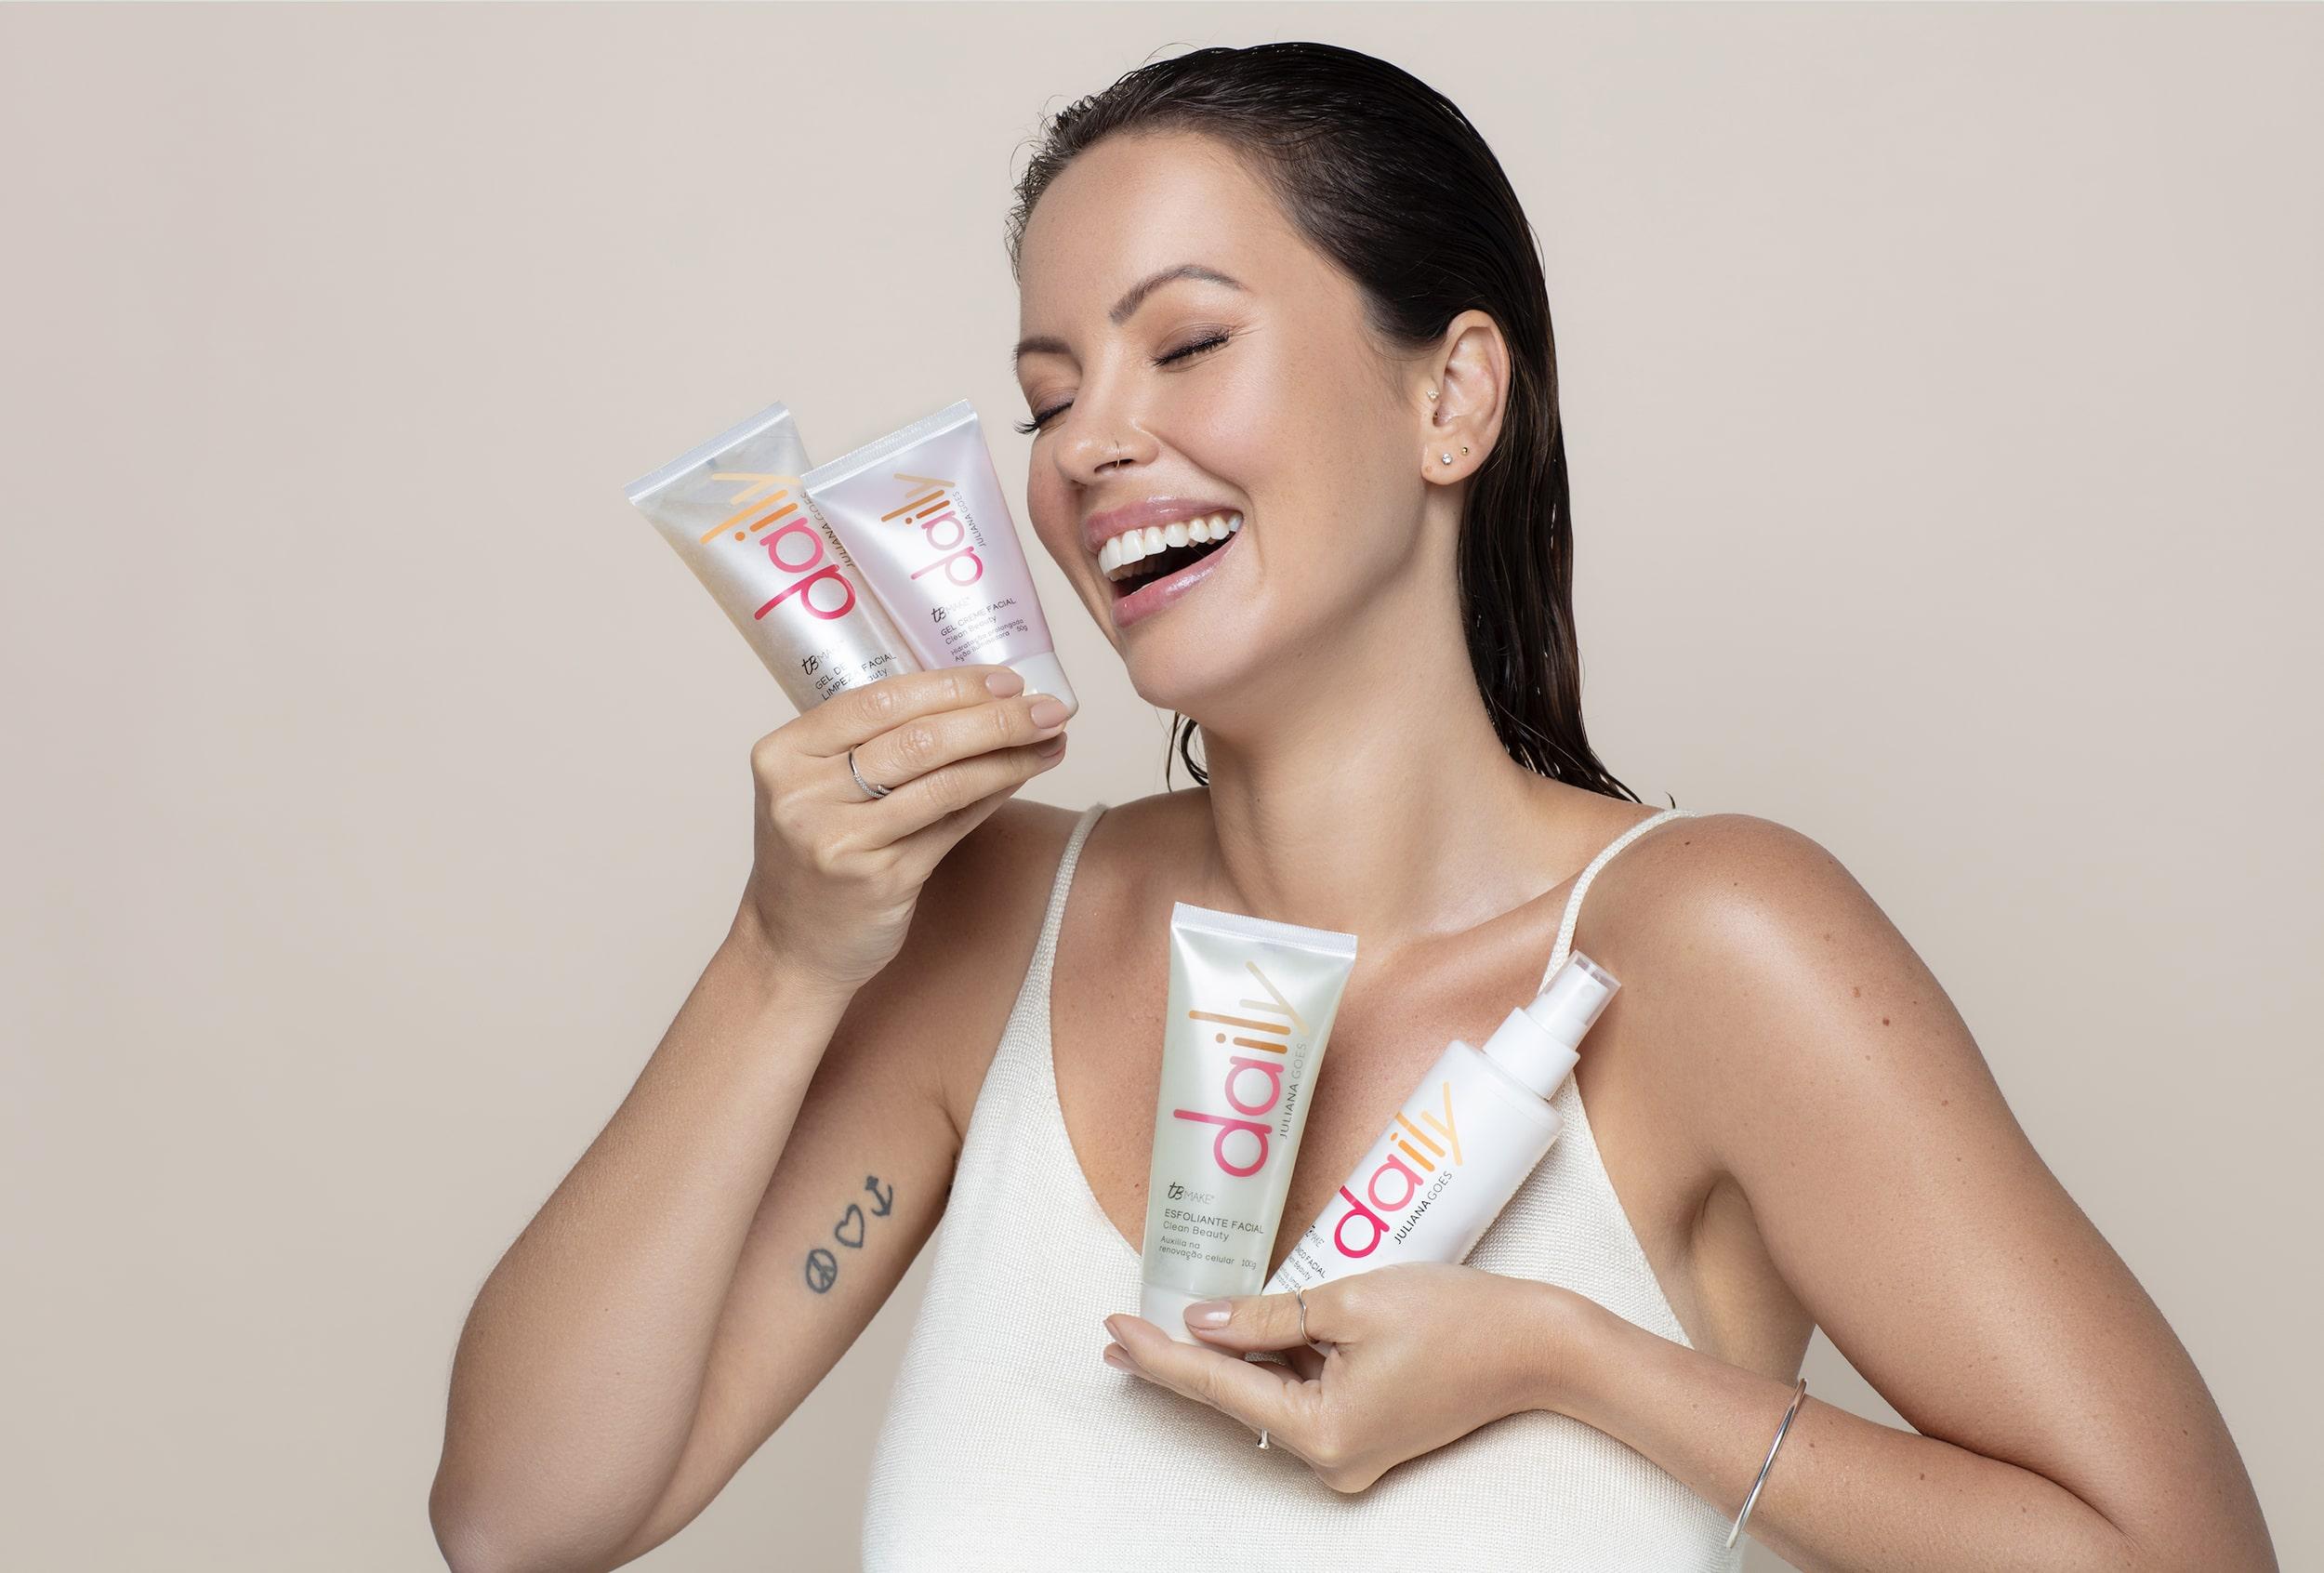 marca de cosmetico vegano da juliana goes